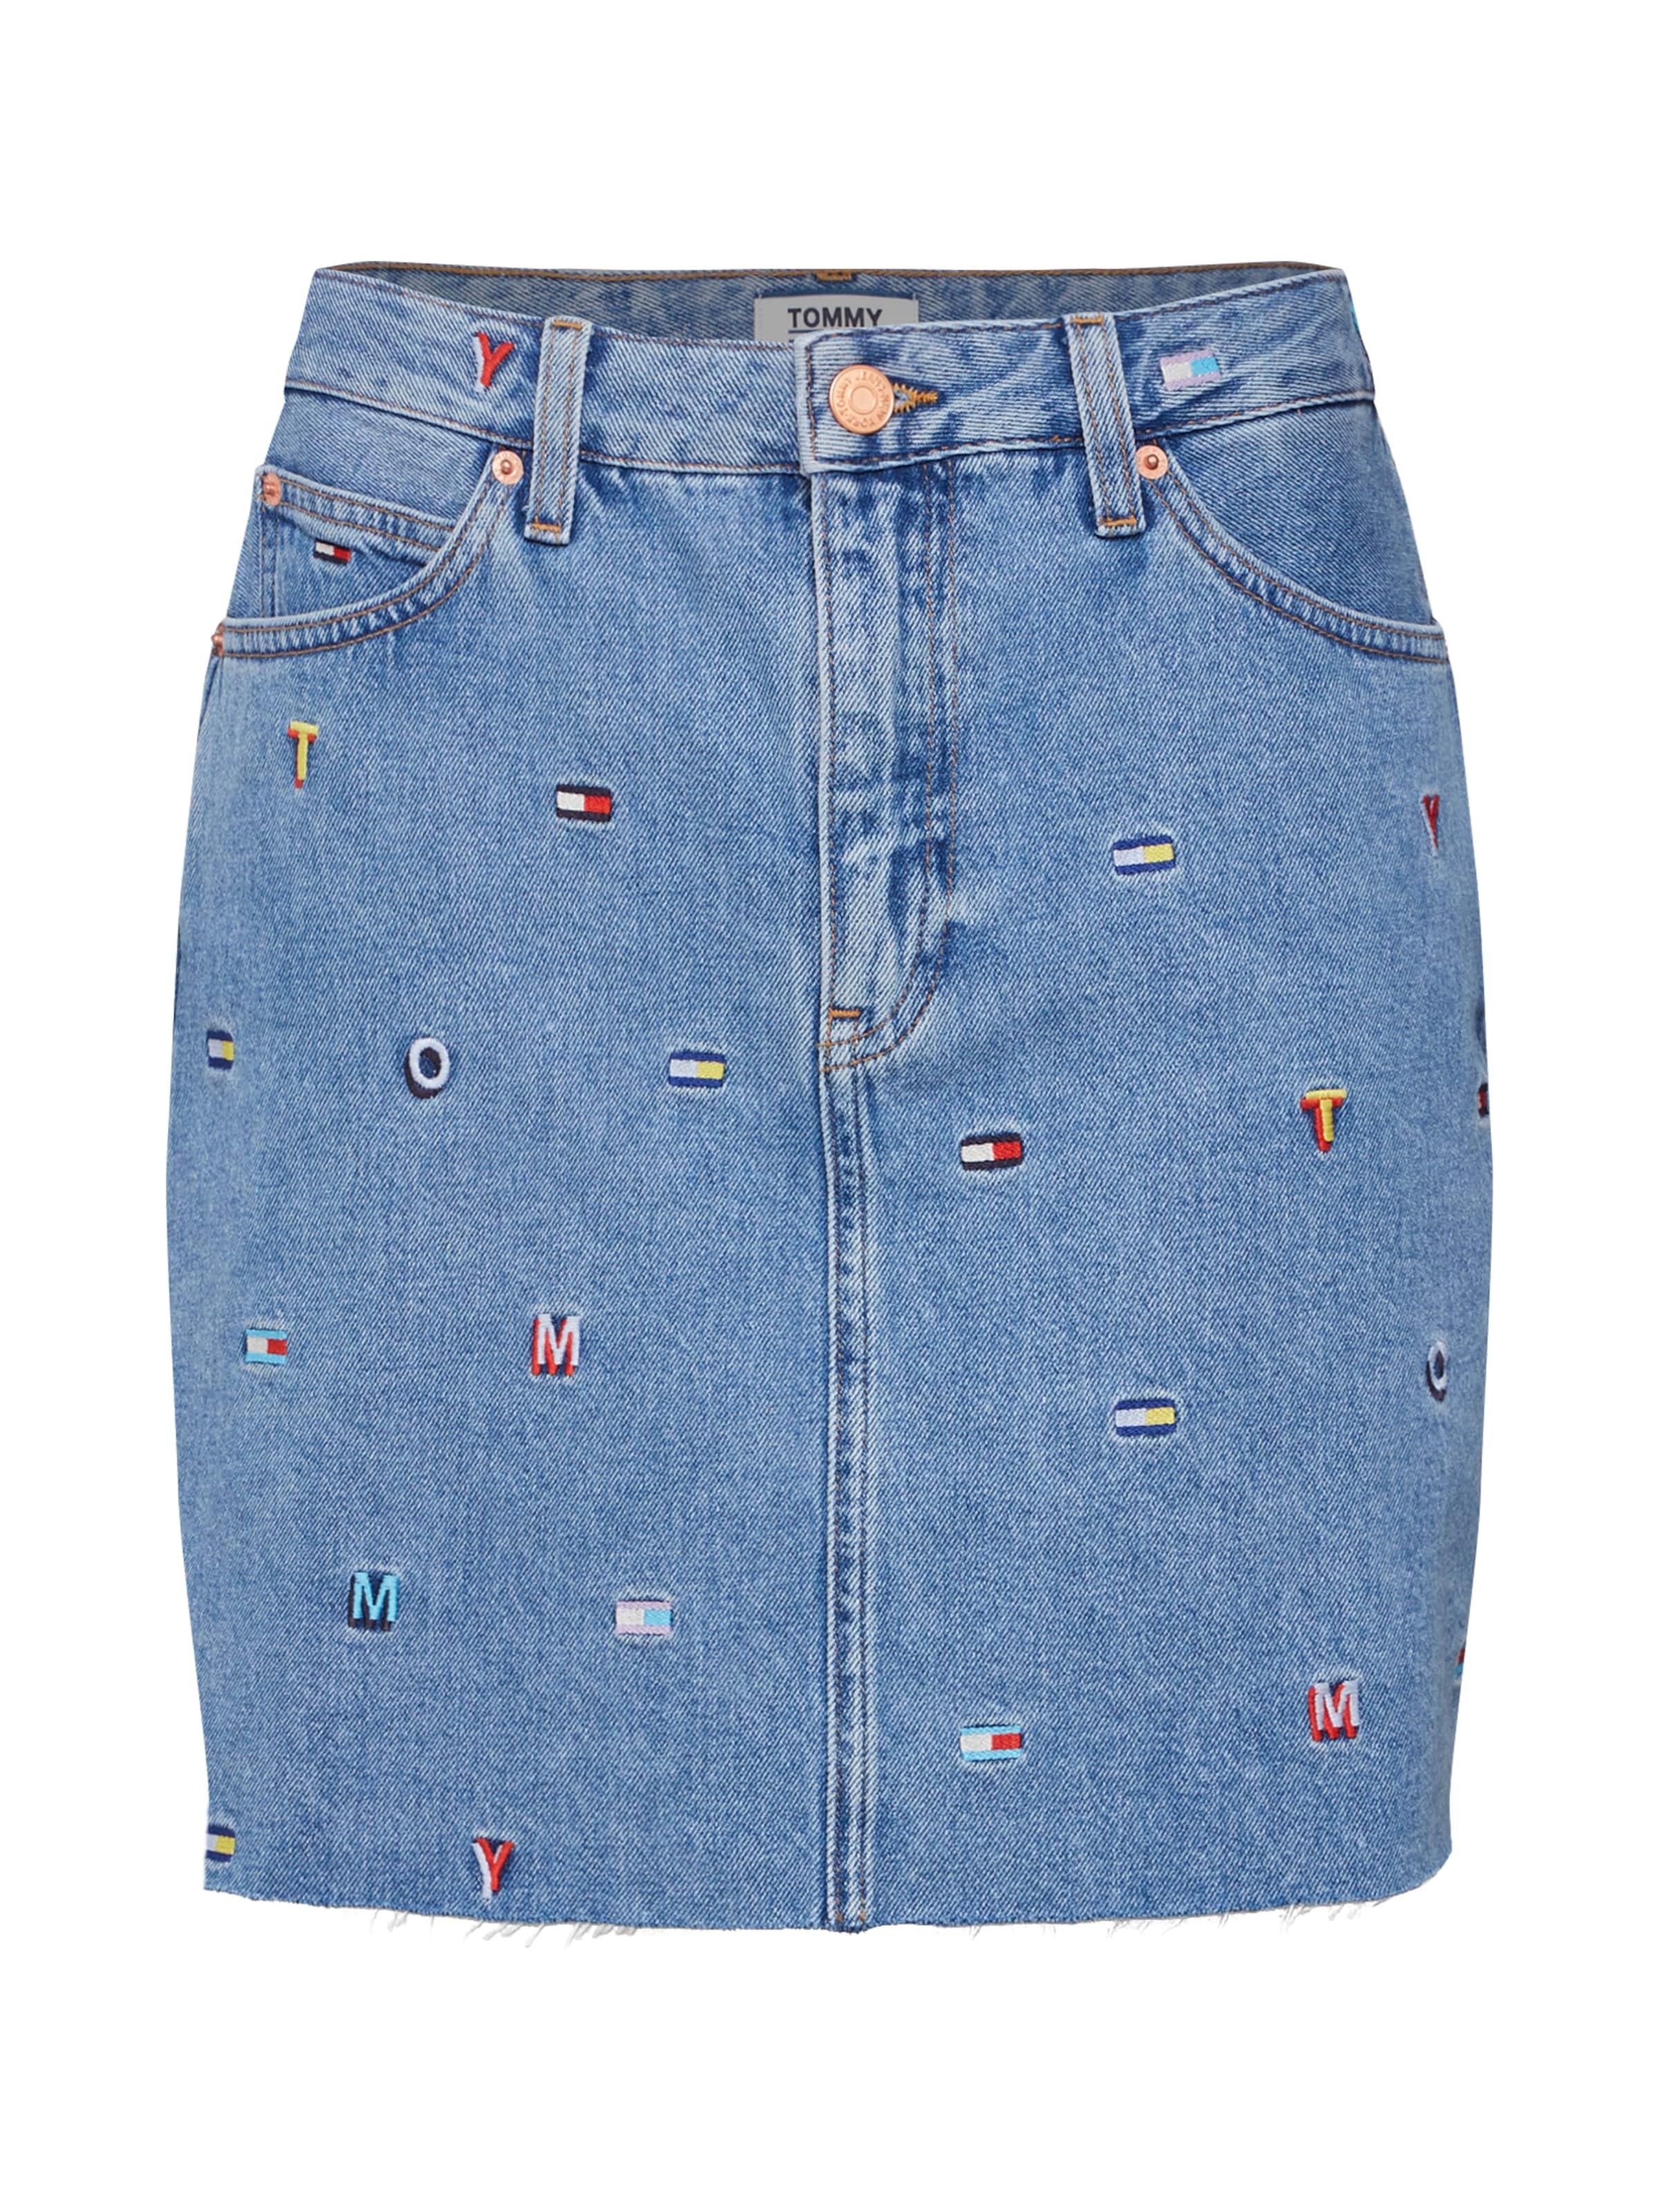 Rock Tommy Jeans In Blue Denim BxoreQWCdE